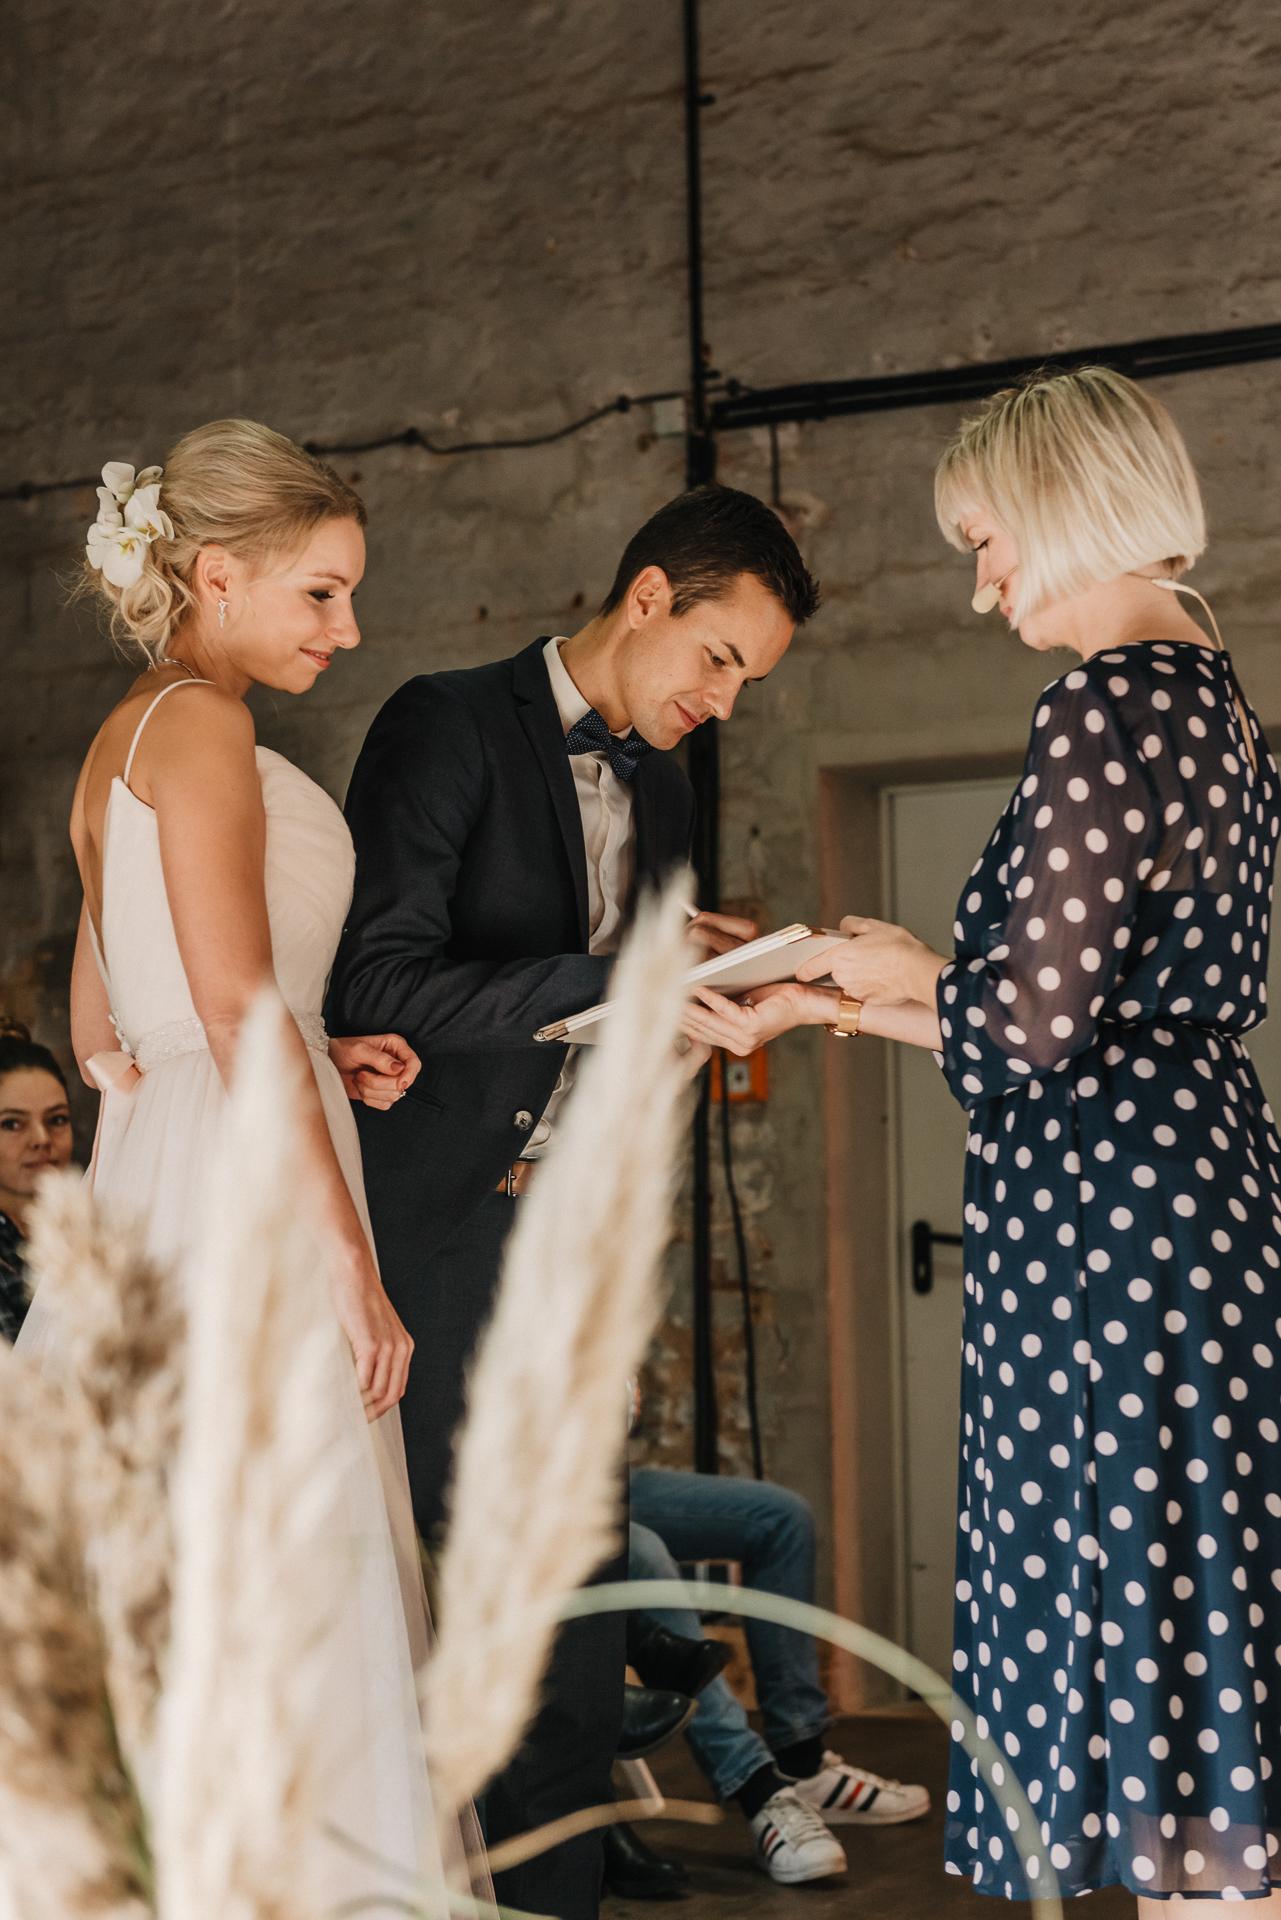 Zweinander-LeonoreHerzog-WeddingMarket-OnTour20191110-8973